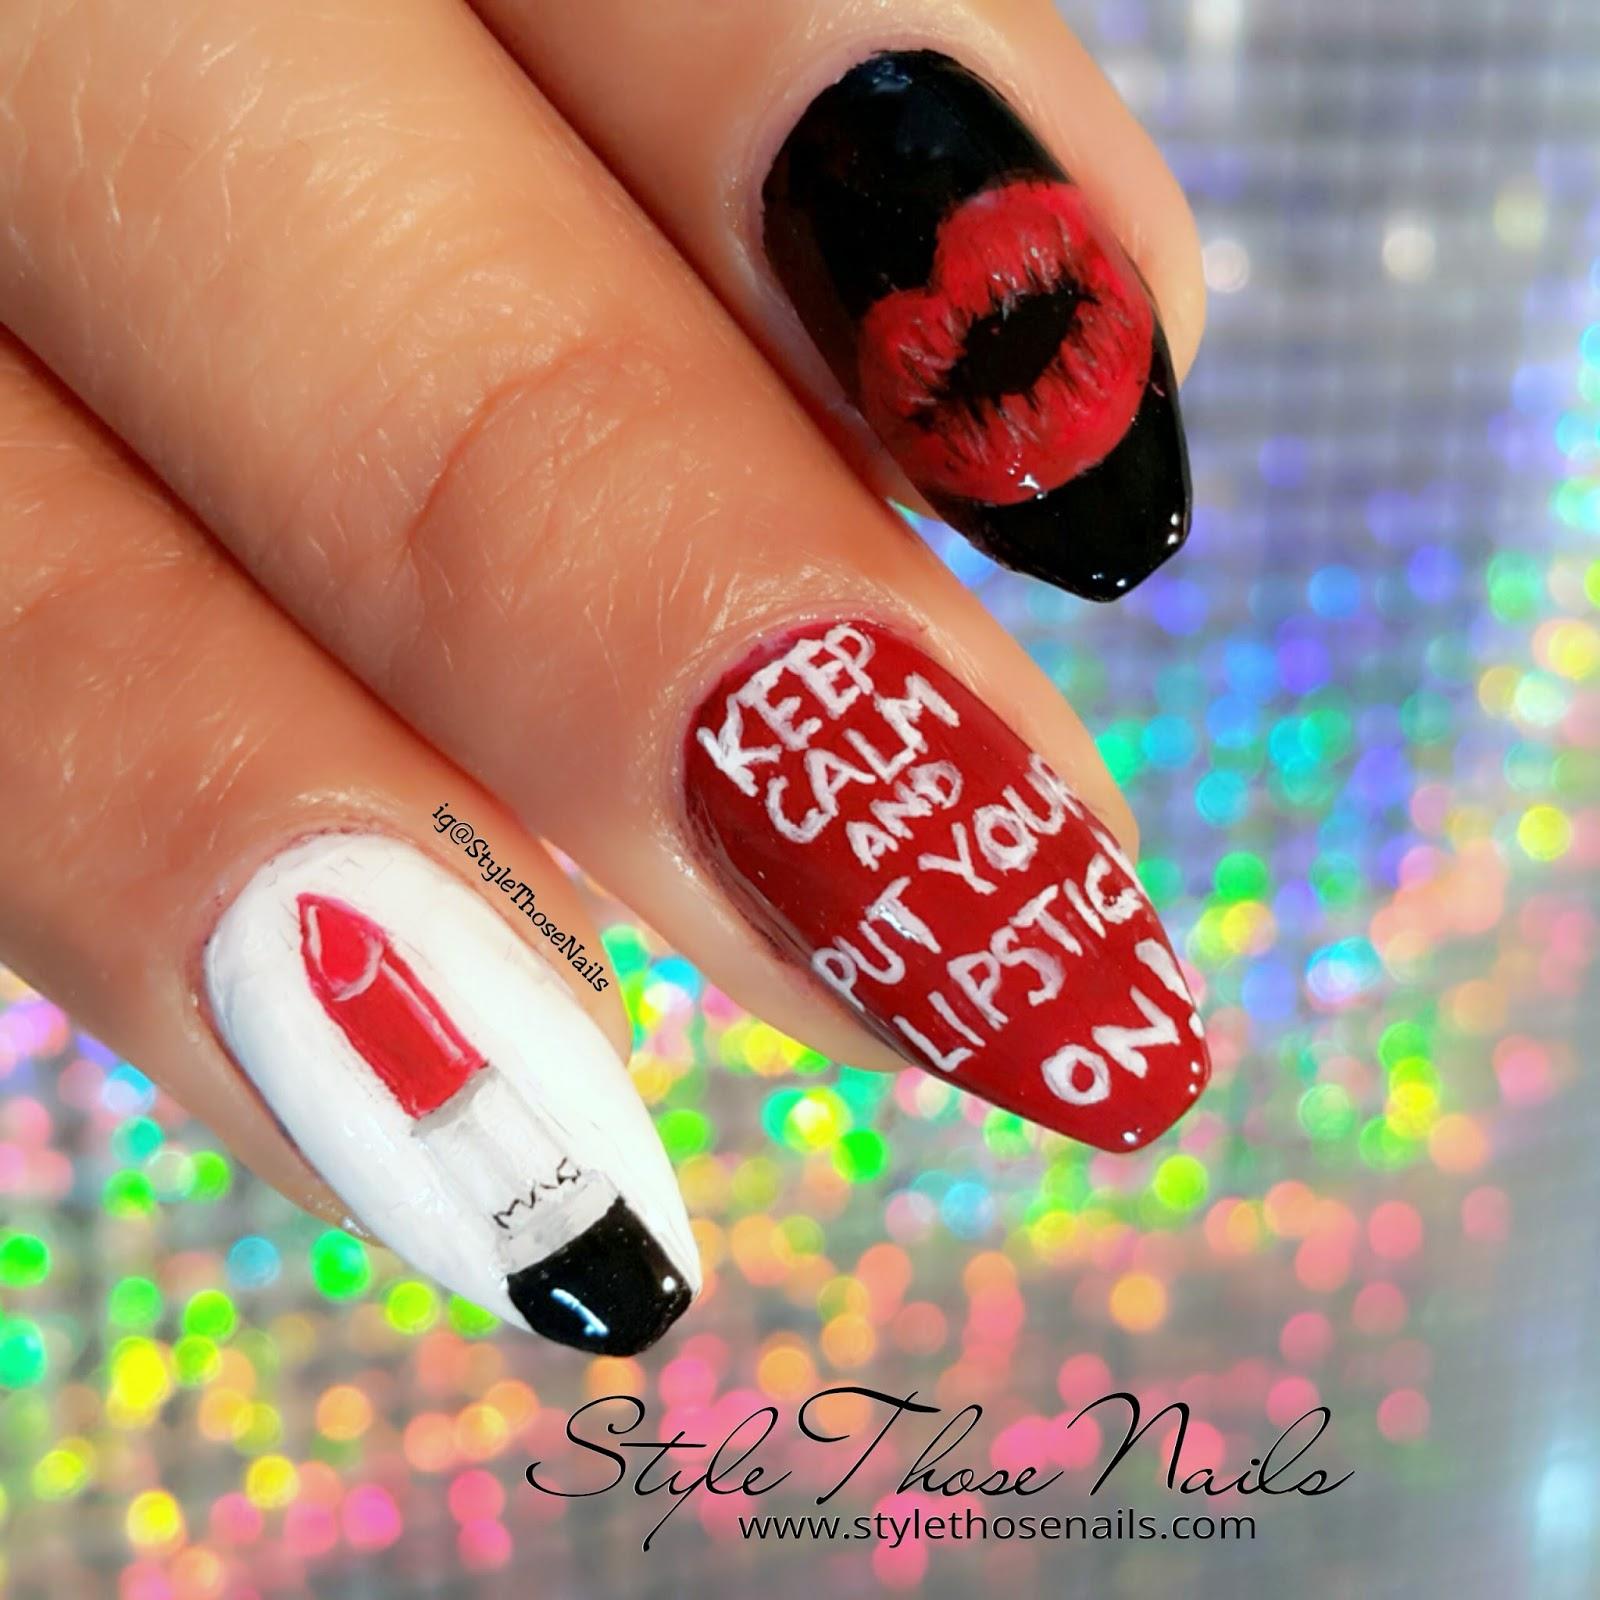 Style Those Nails Nail Collaboration